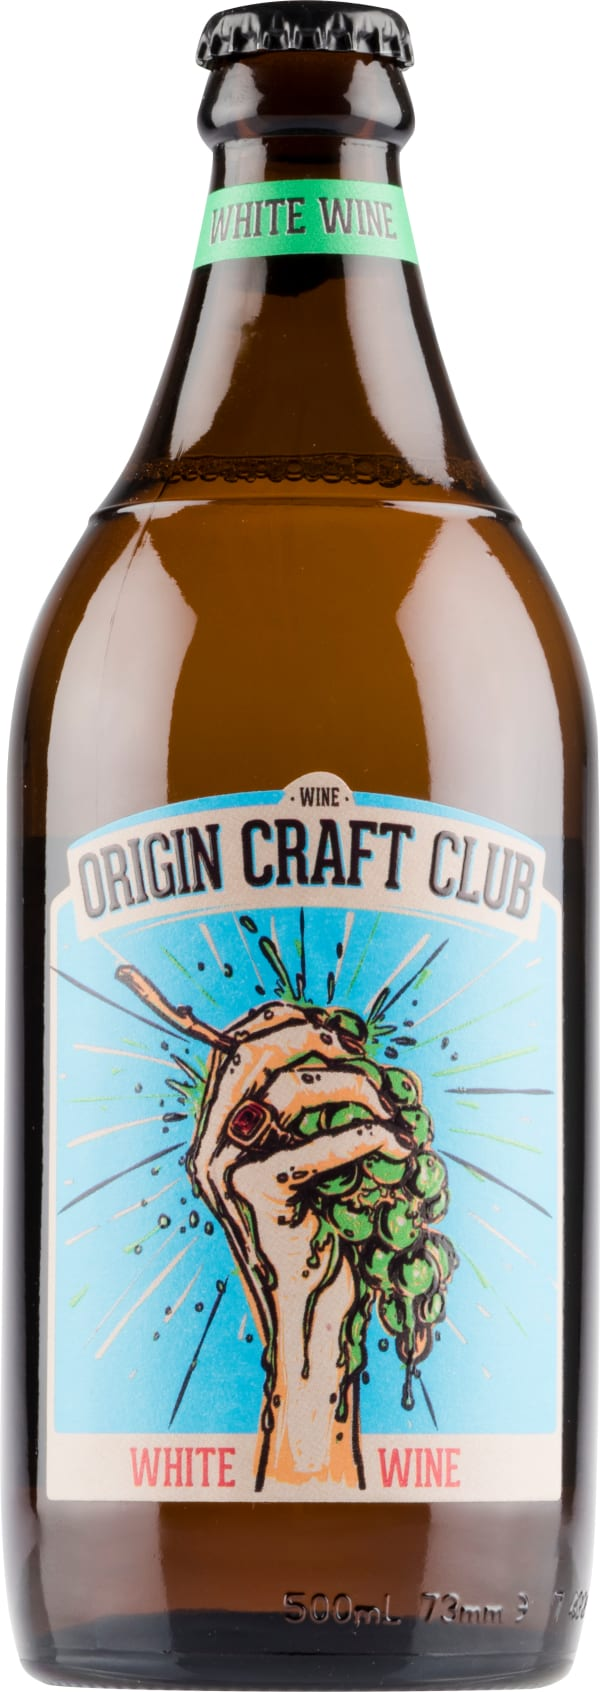 Origin Craft Club White 2018